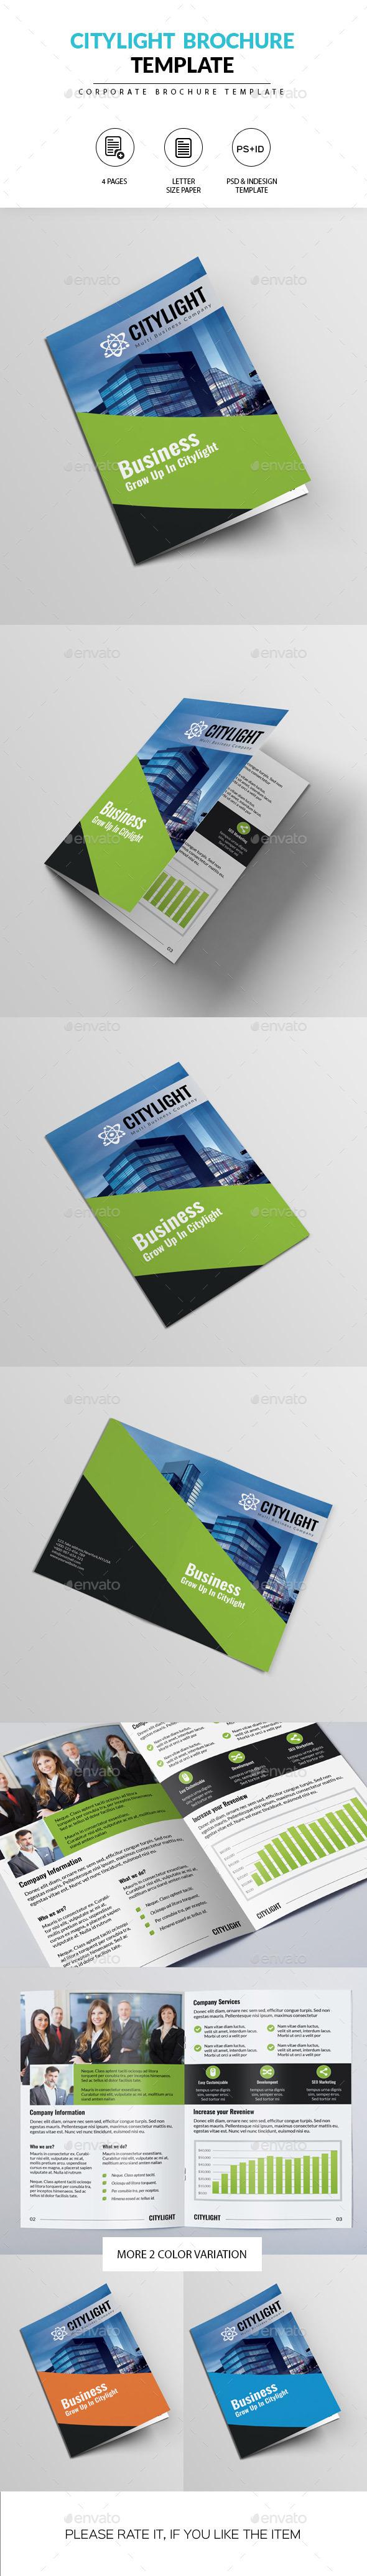 Corporate Brochure-CityLight - Corporate Brochures